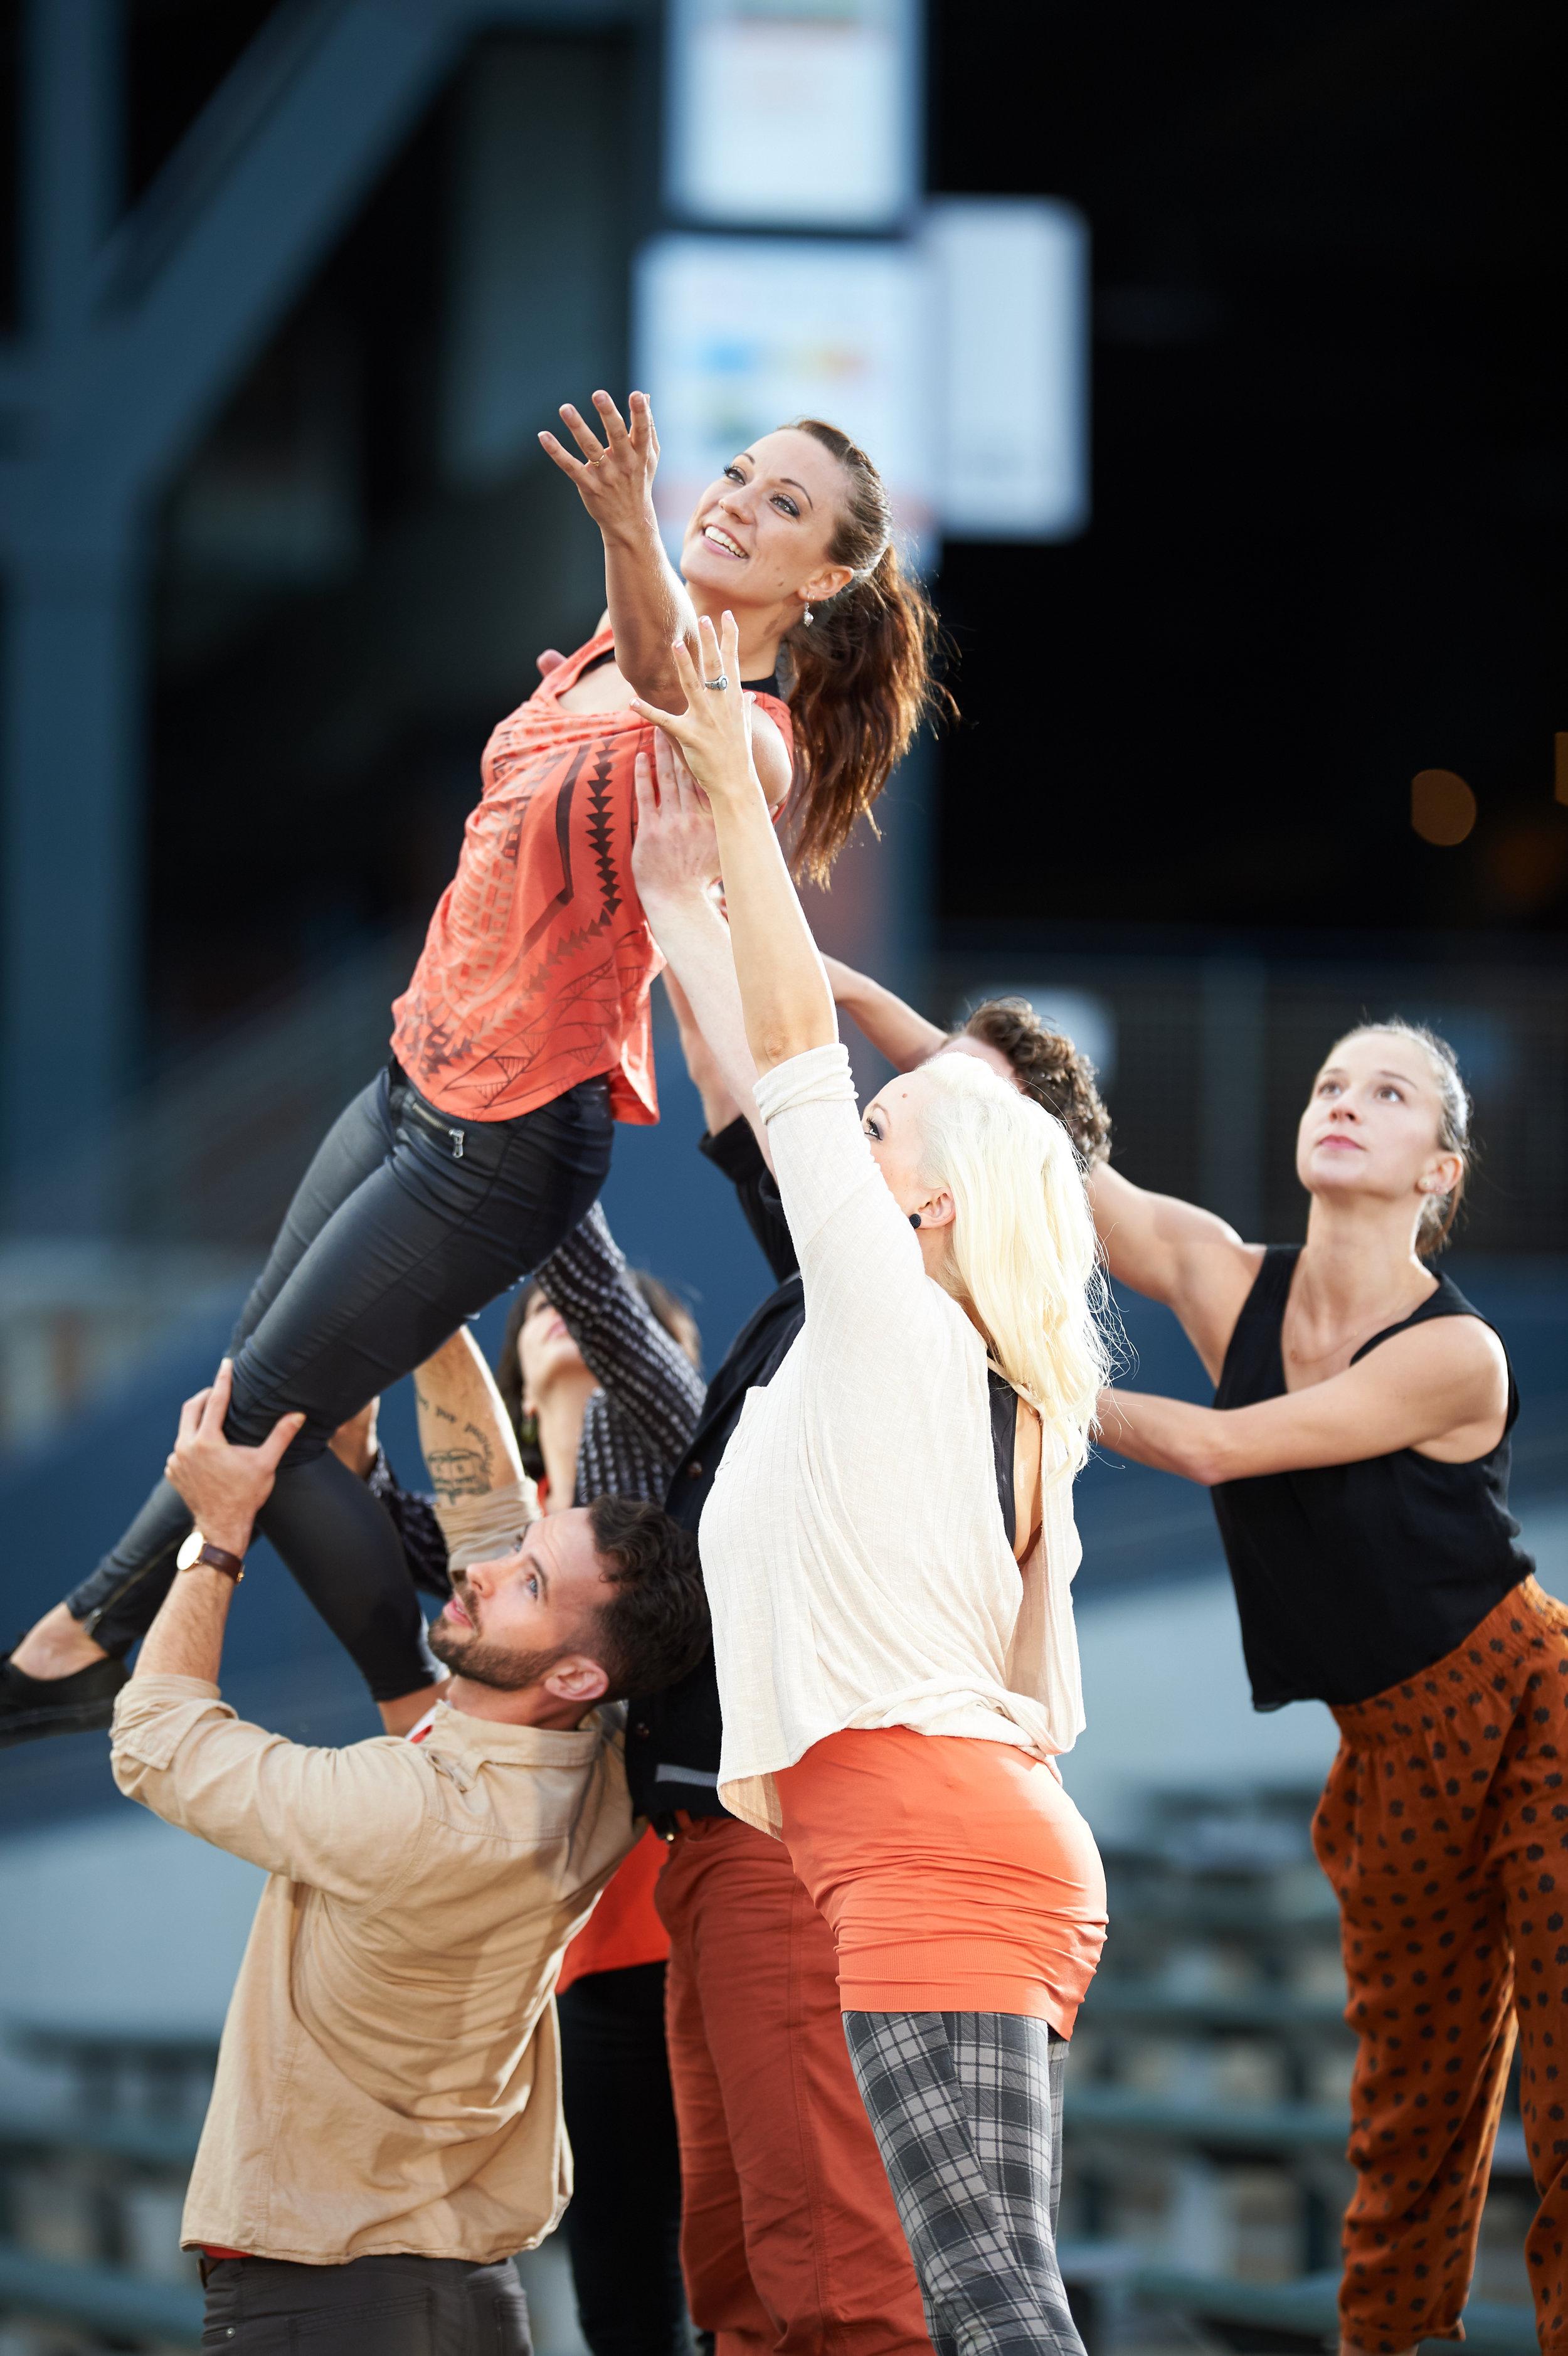 Erica Chipp and BaseBallet dancers in the bleachers [Photo by David DeSilva]